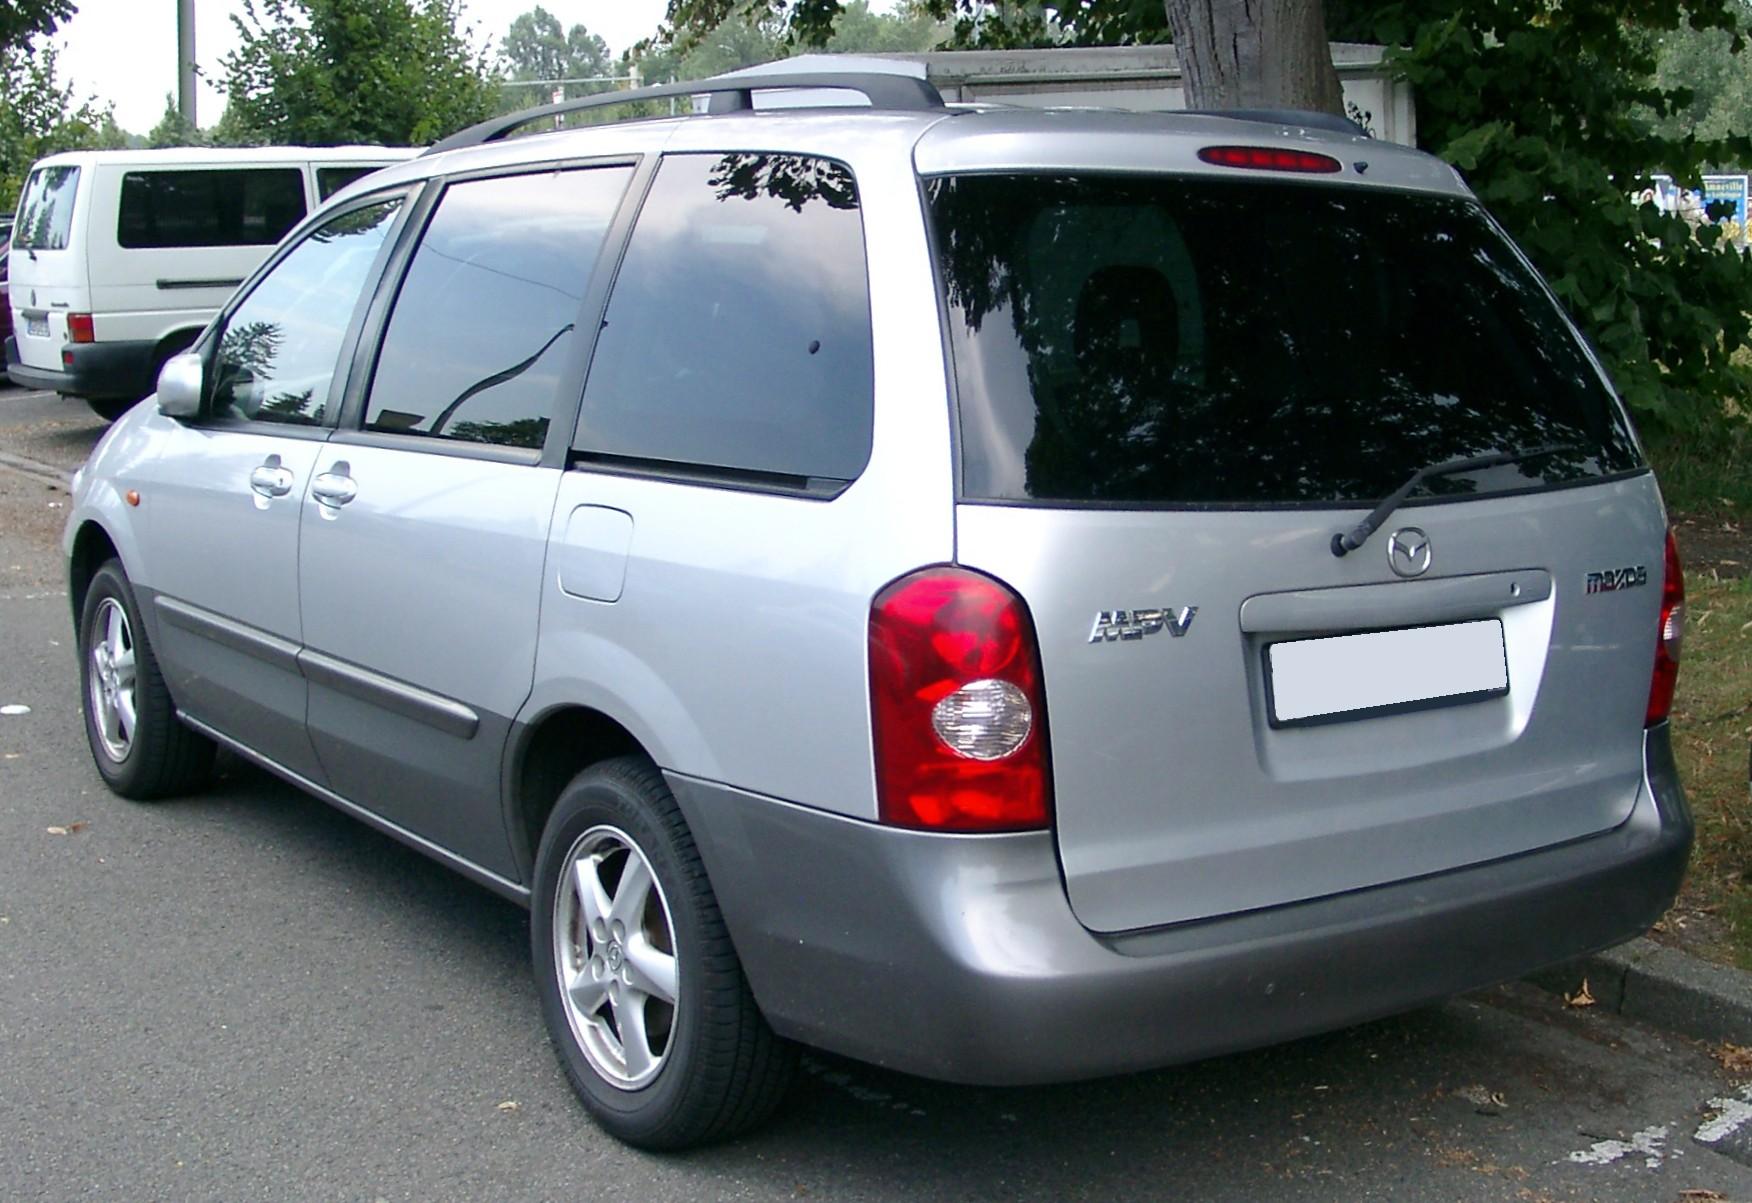 https://upload.wikimedia.org/wikipedia/commons/f/fd/Mazda_MPV_rear_20080728.jpg